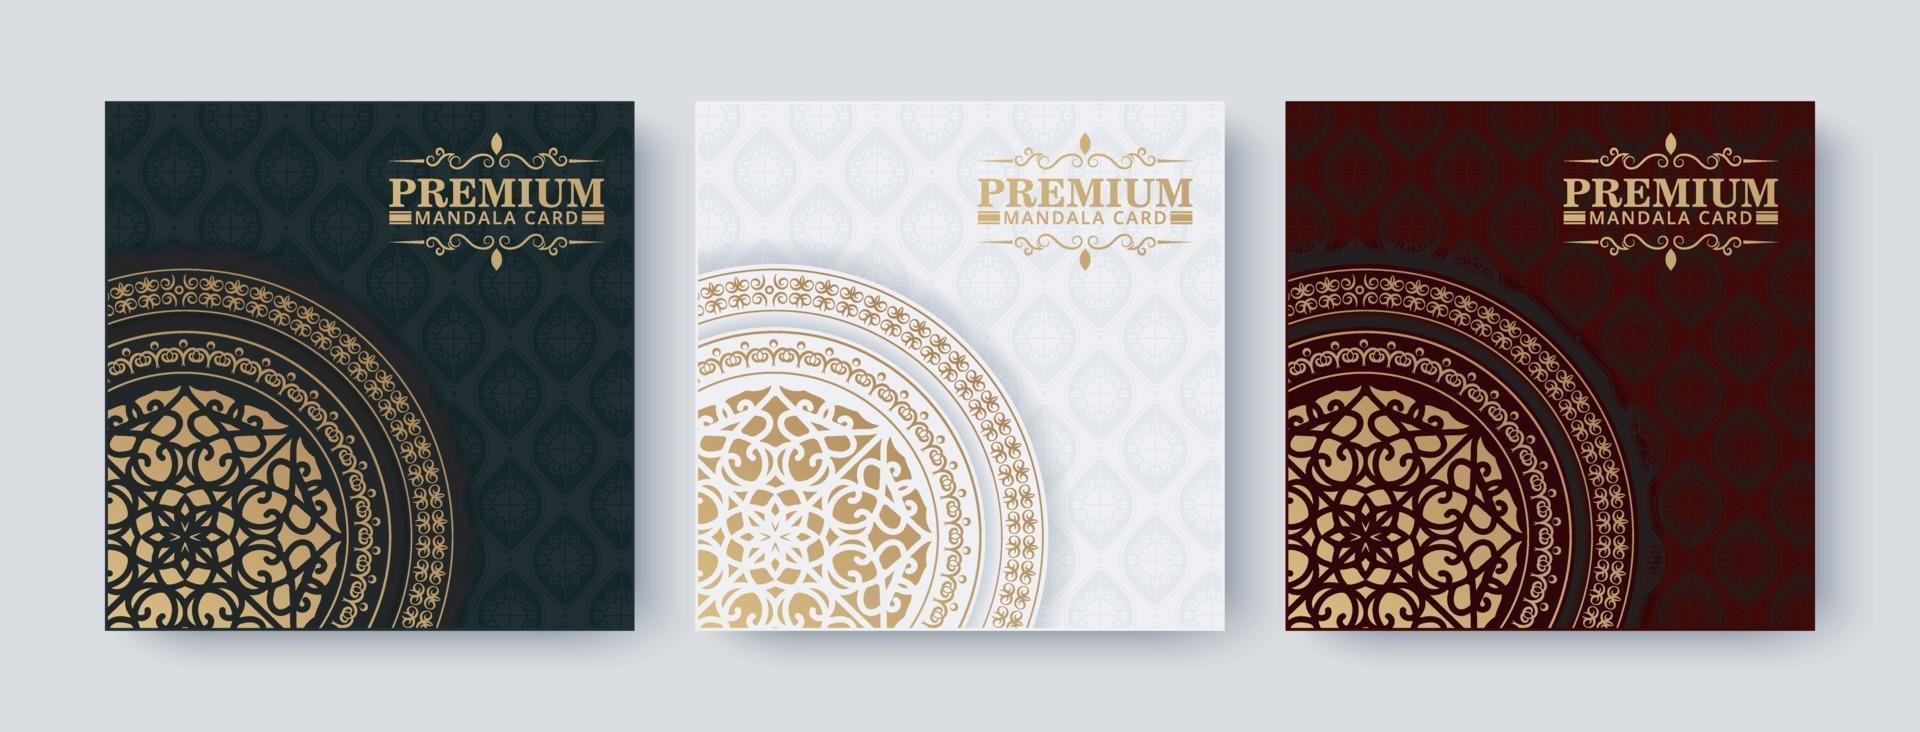 luxe mandala achtergrond conceptontwerp vector